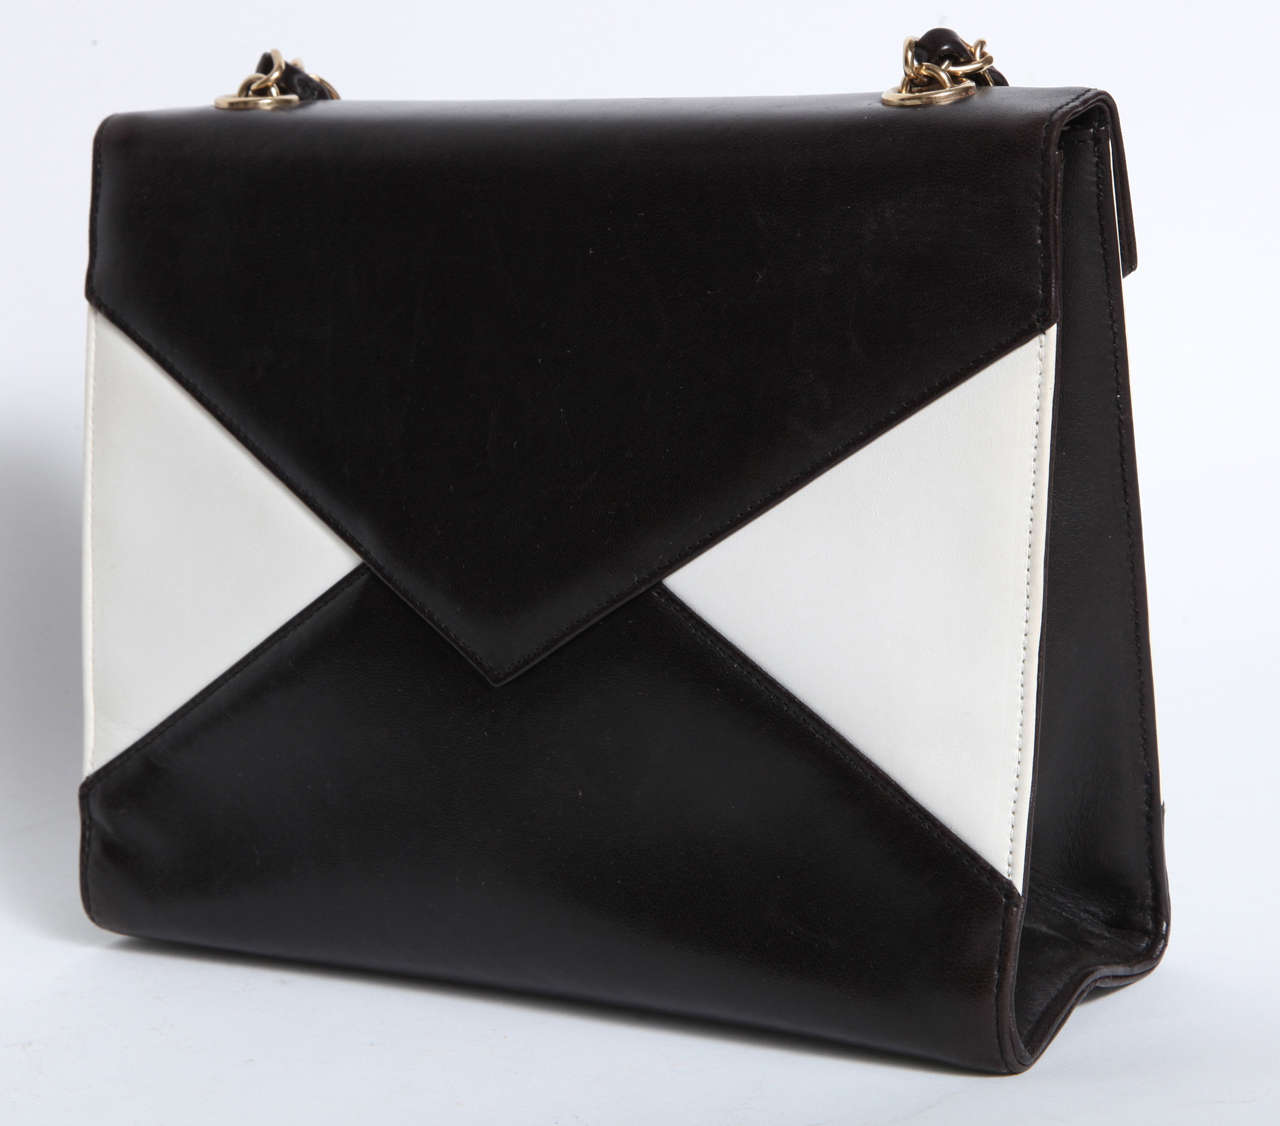 Vintage Chanel Black and White Handbag 4